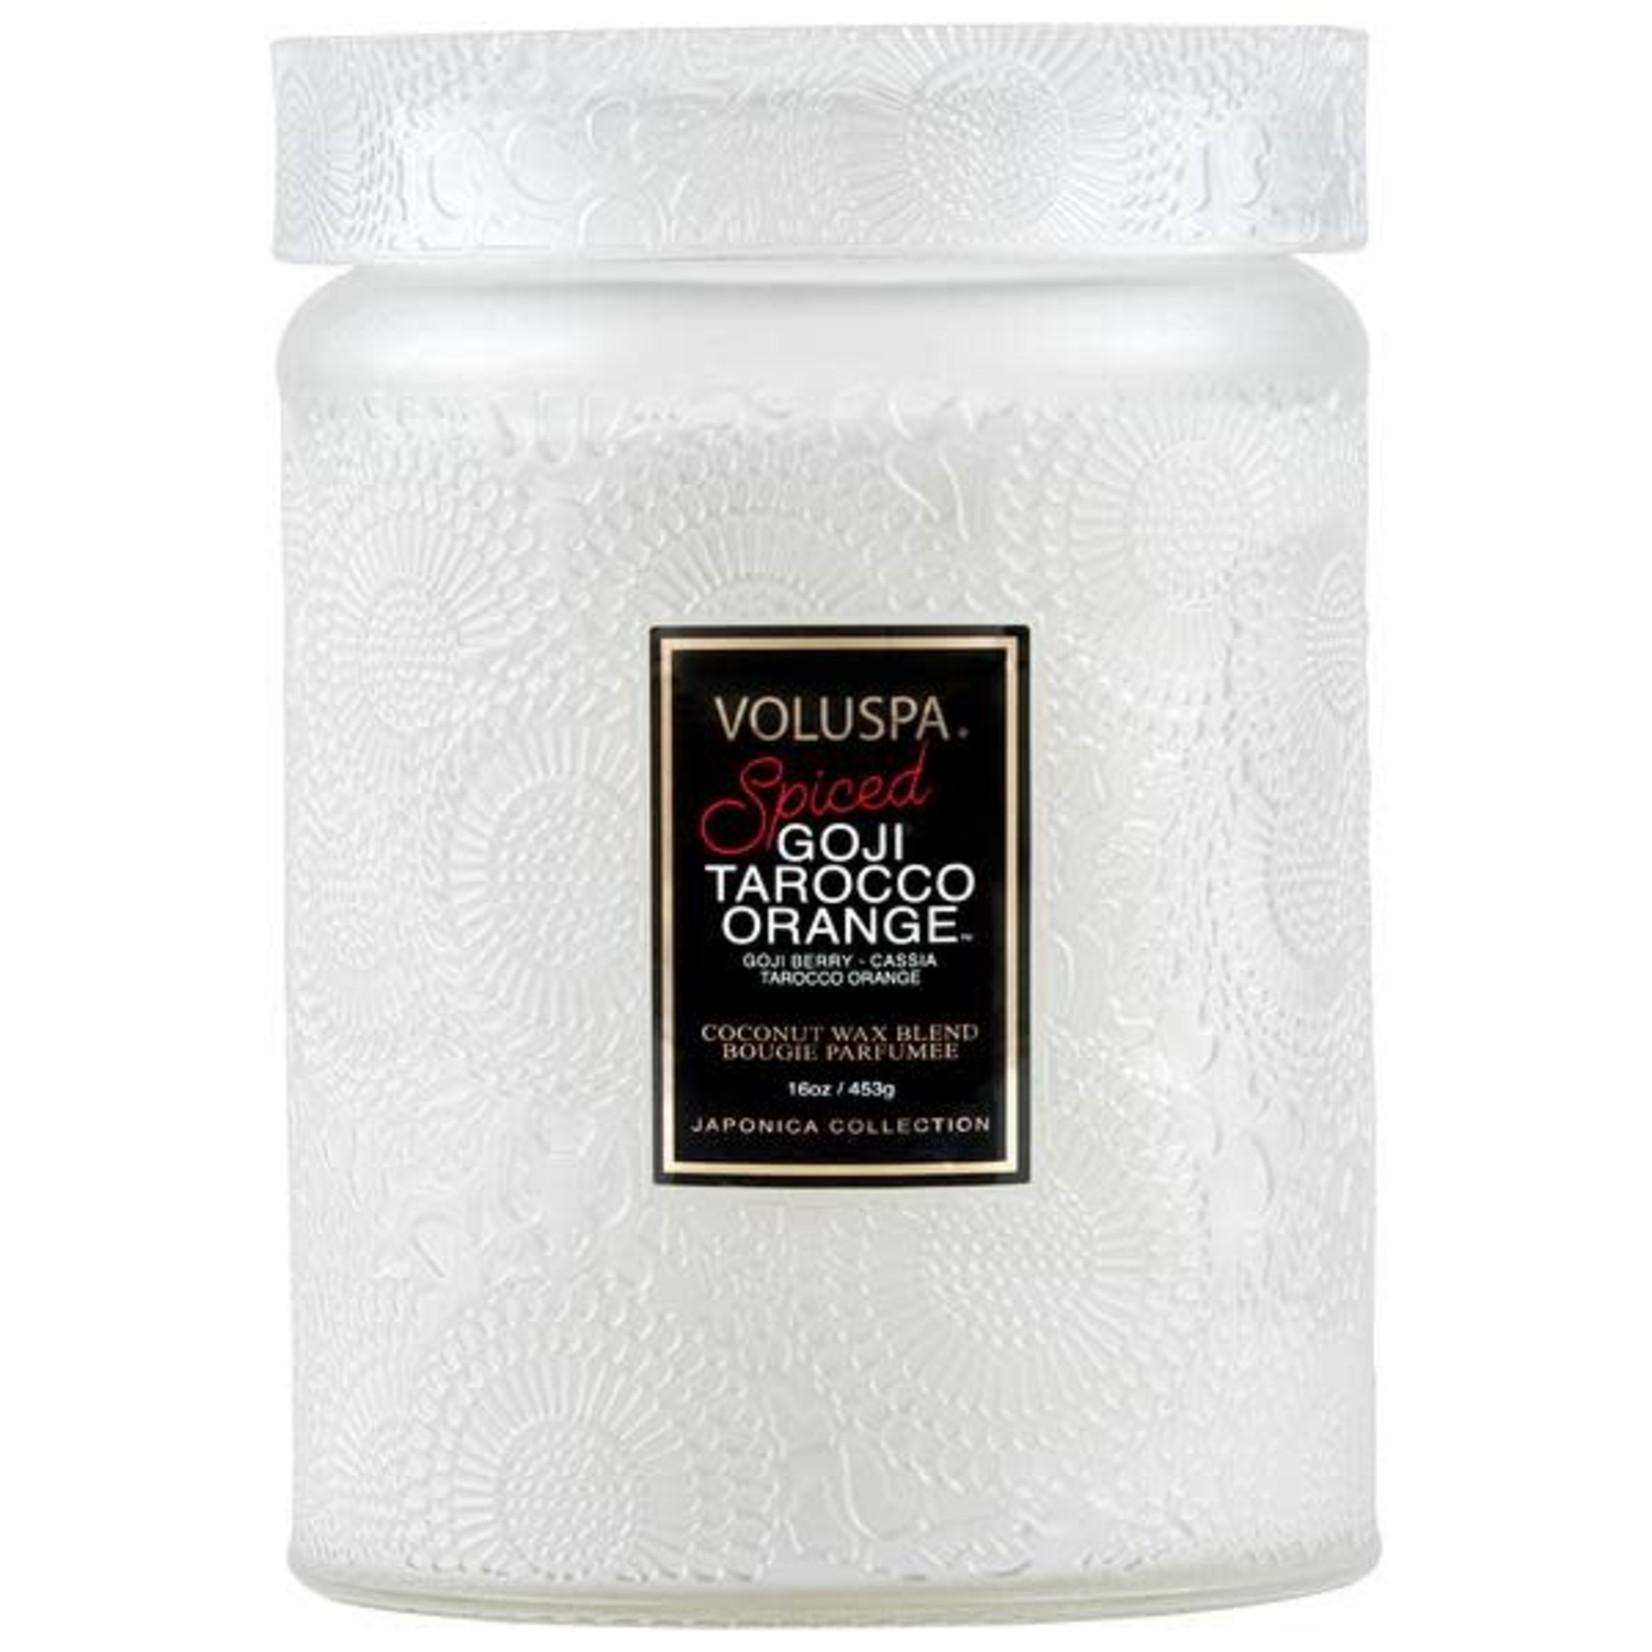 Voluspa Large Glass Jar Candle